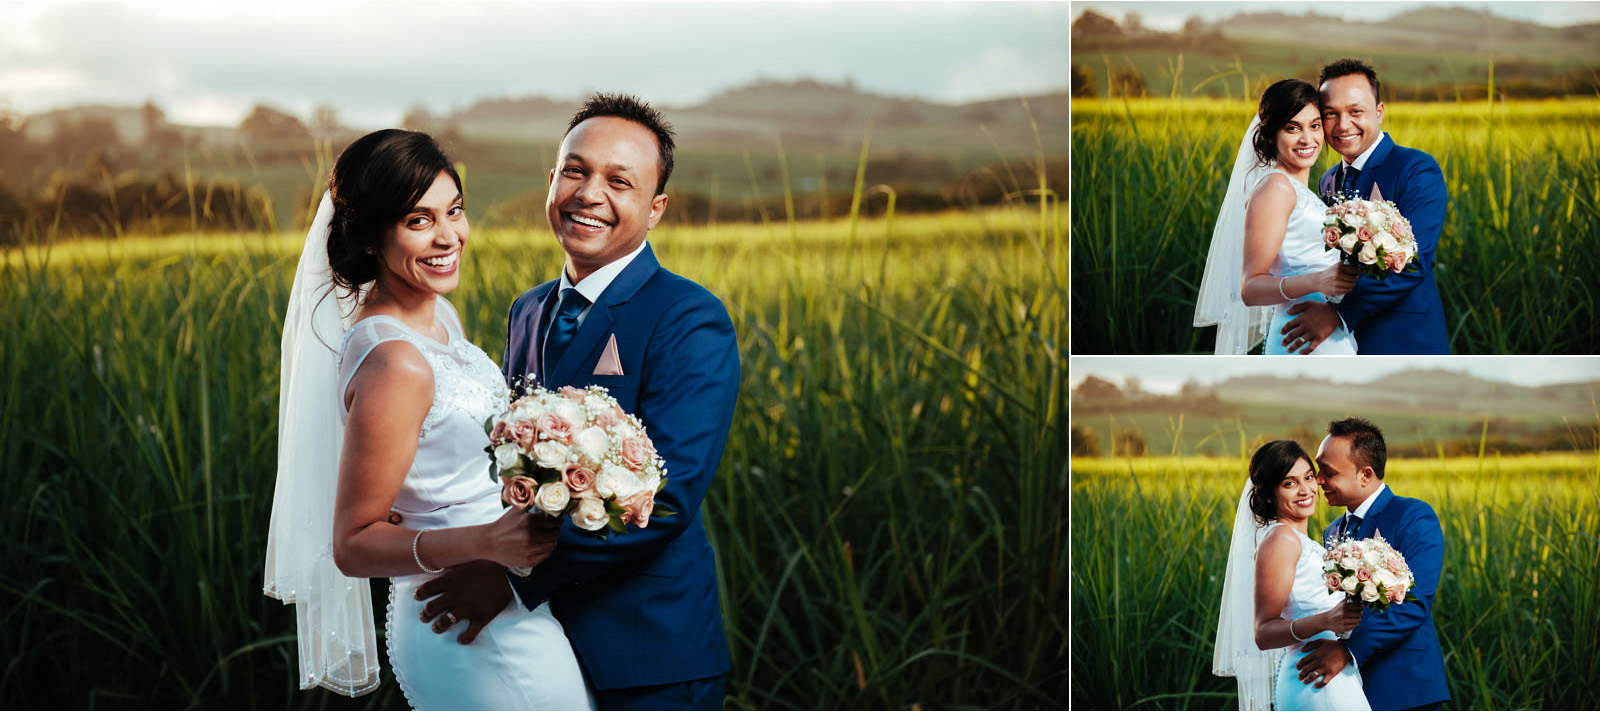 meandor manor wedding rbadal couples shoot sunset